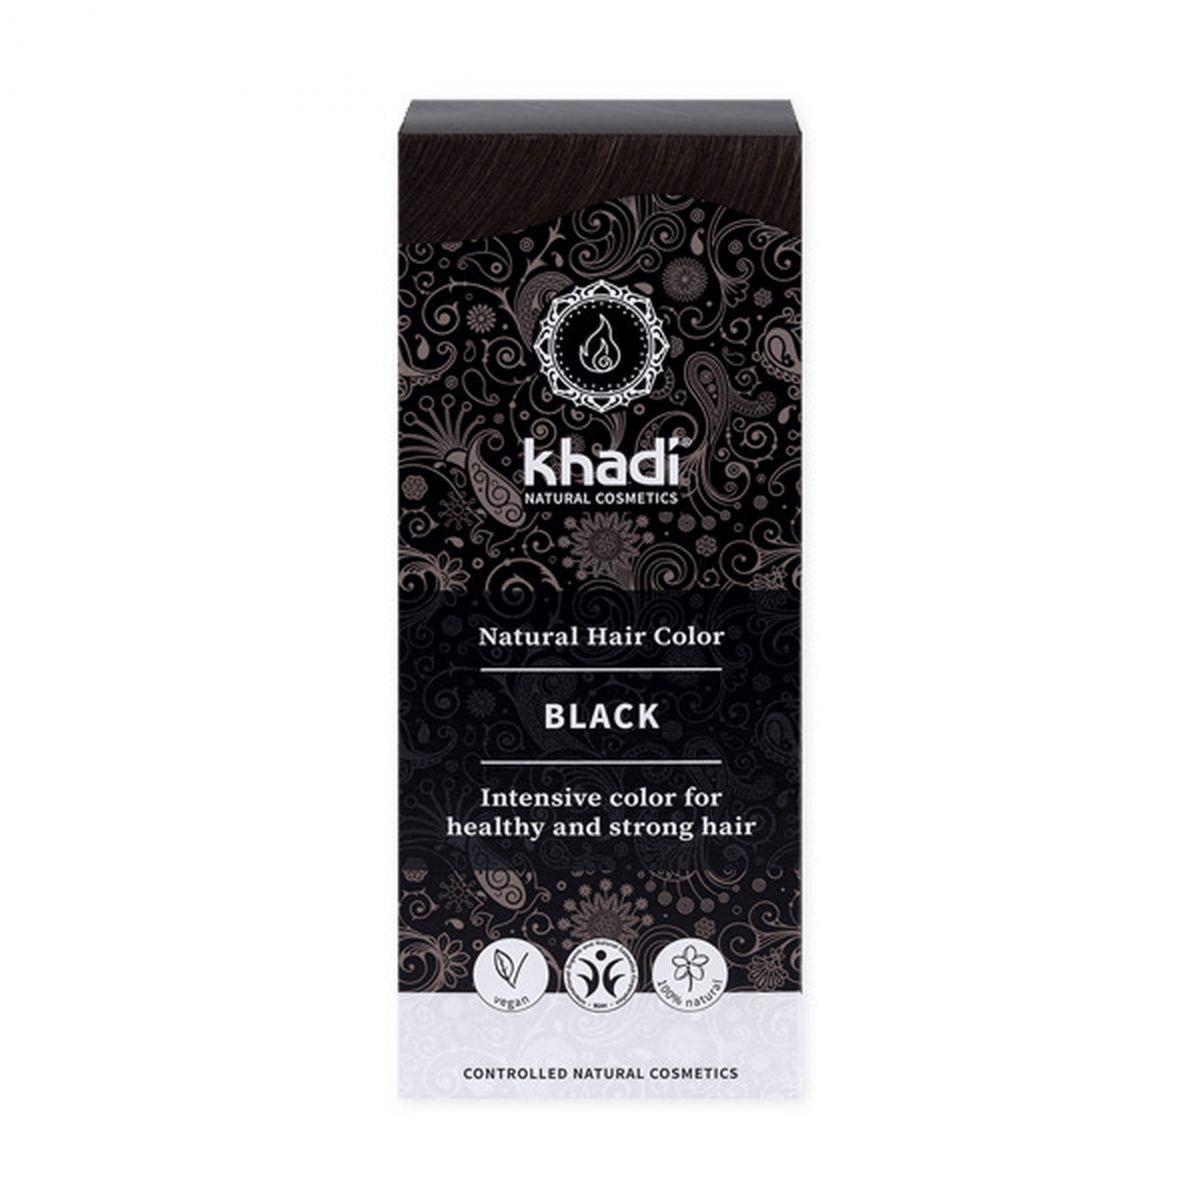 Naturalna indyjska henna - czarna - 100g - Khadi